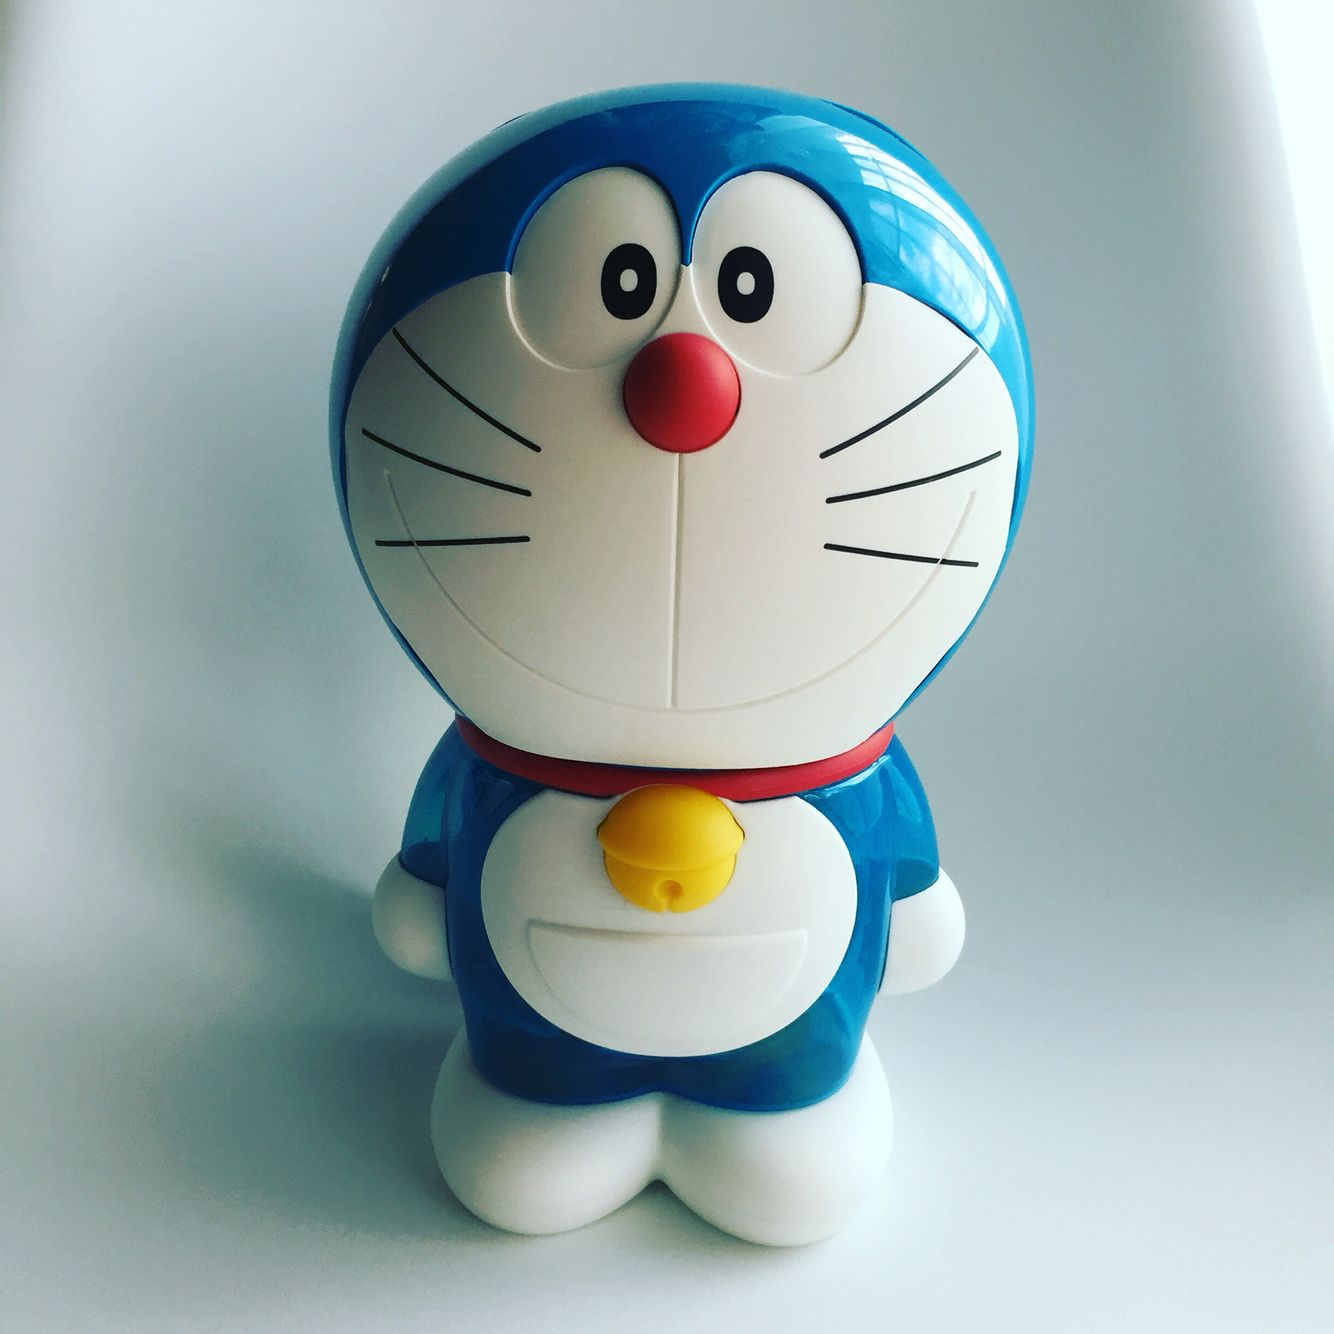 Pin by น้องเหวย คอนหวัน on Doraemon Doraemon, Anime